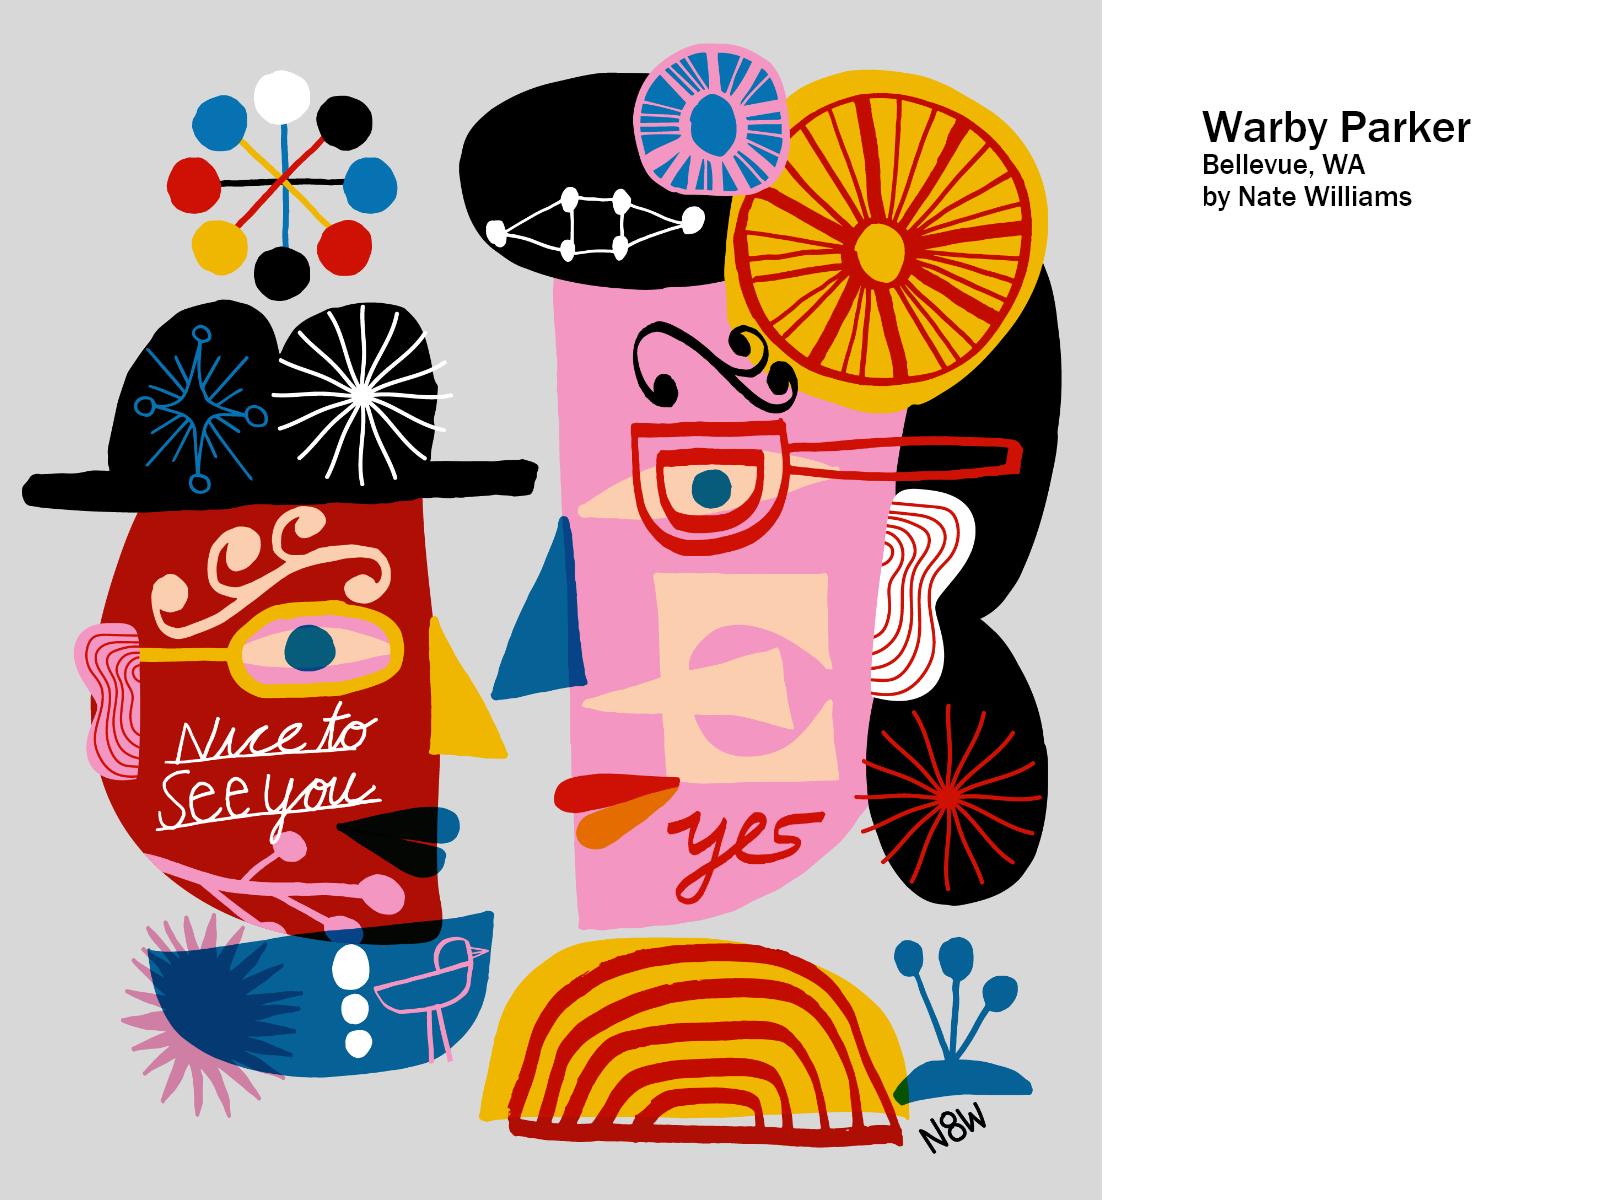 Warby Parker - Bellevue, Washington USA process interior mural design illustration nate williams